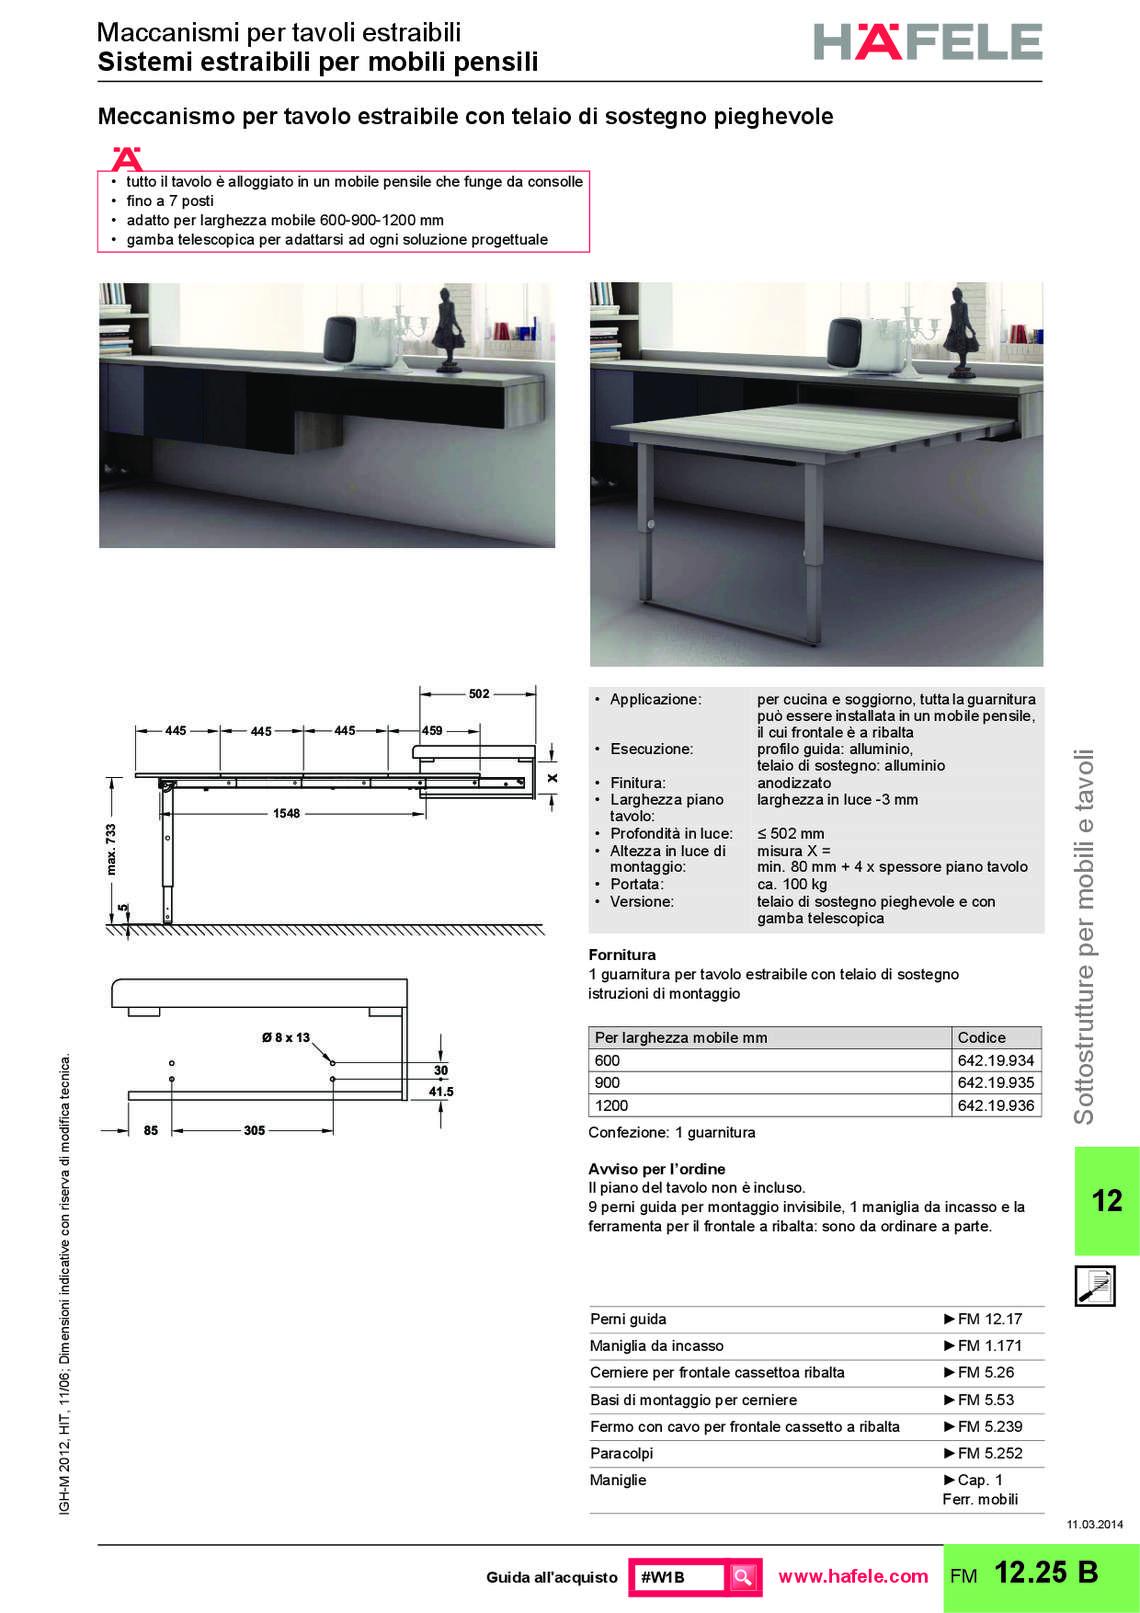 hafele-sottostrutture-per-mobili_83_043.jpg